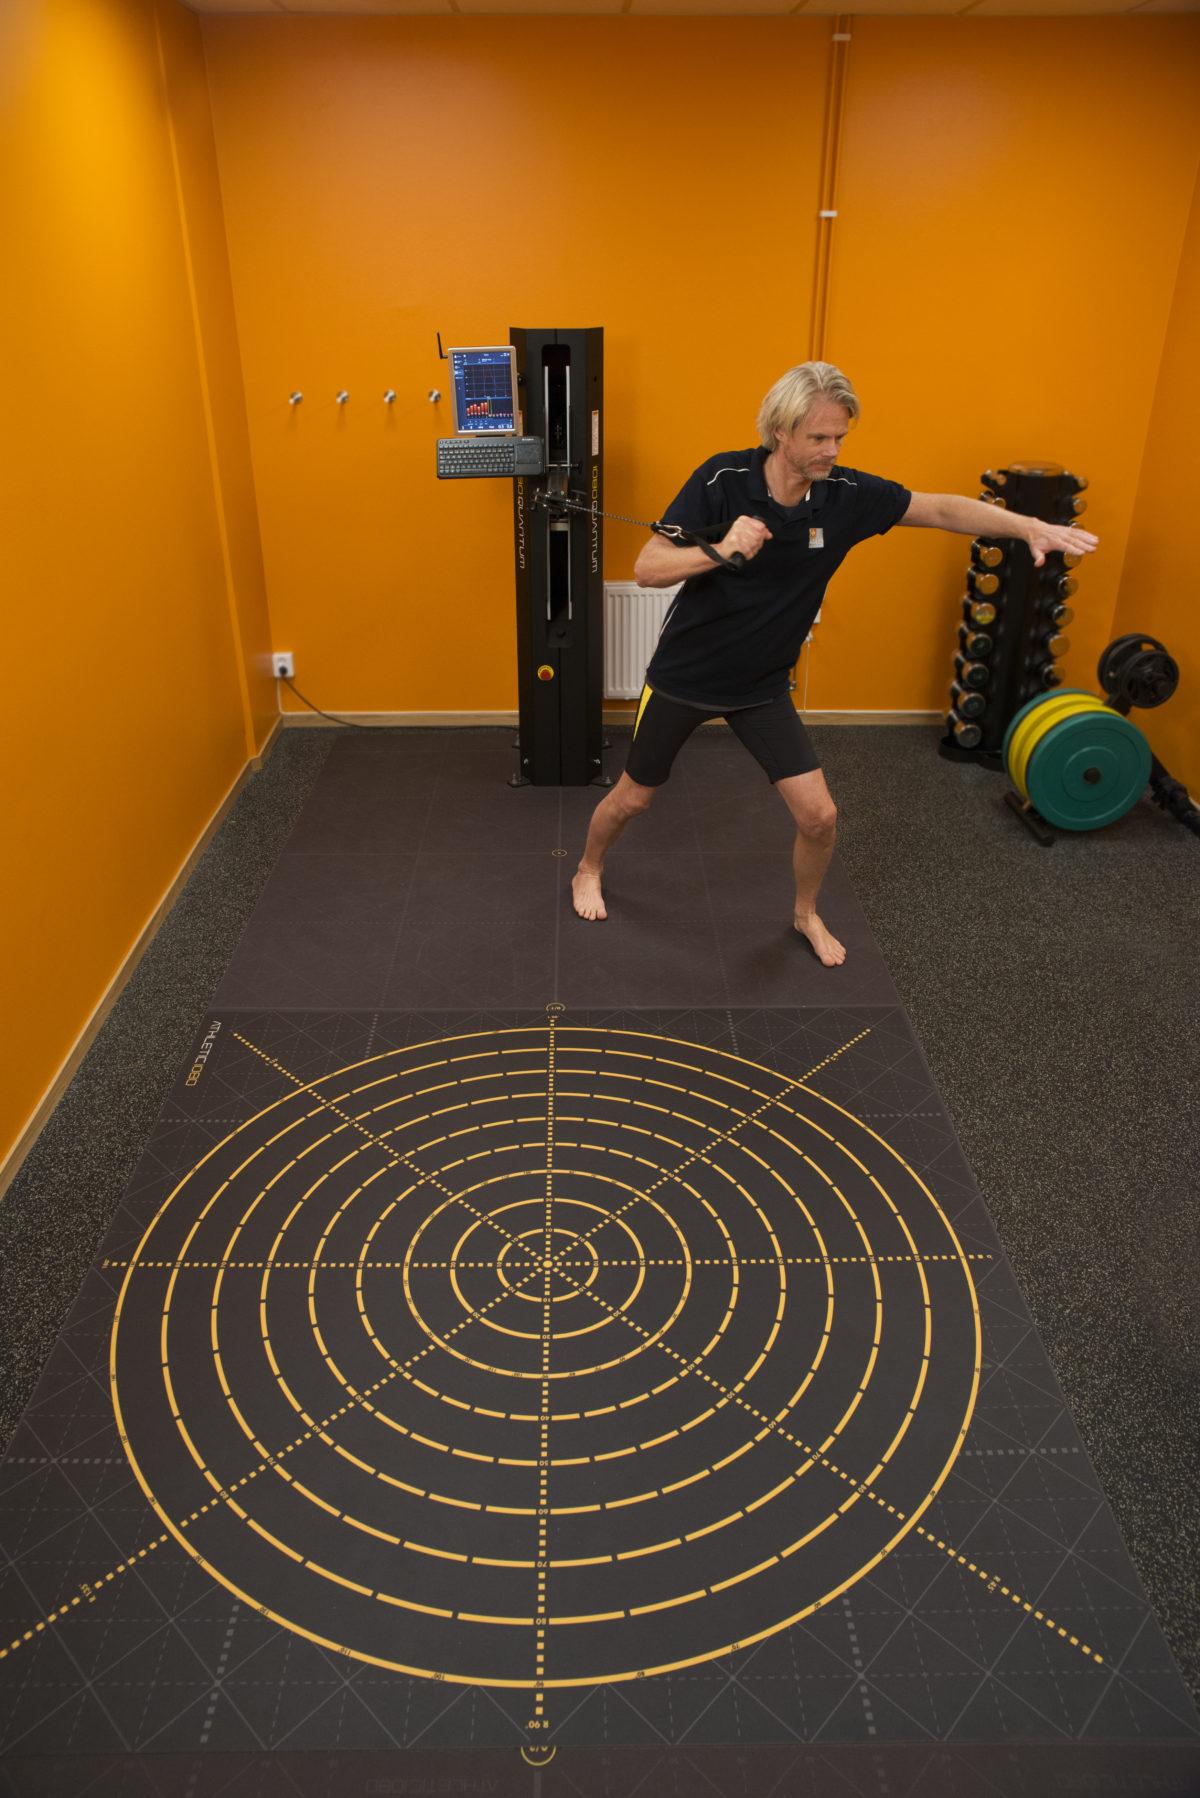 rehabilitering axelvärk naprapat fysioterapi